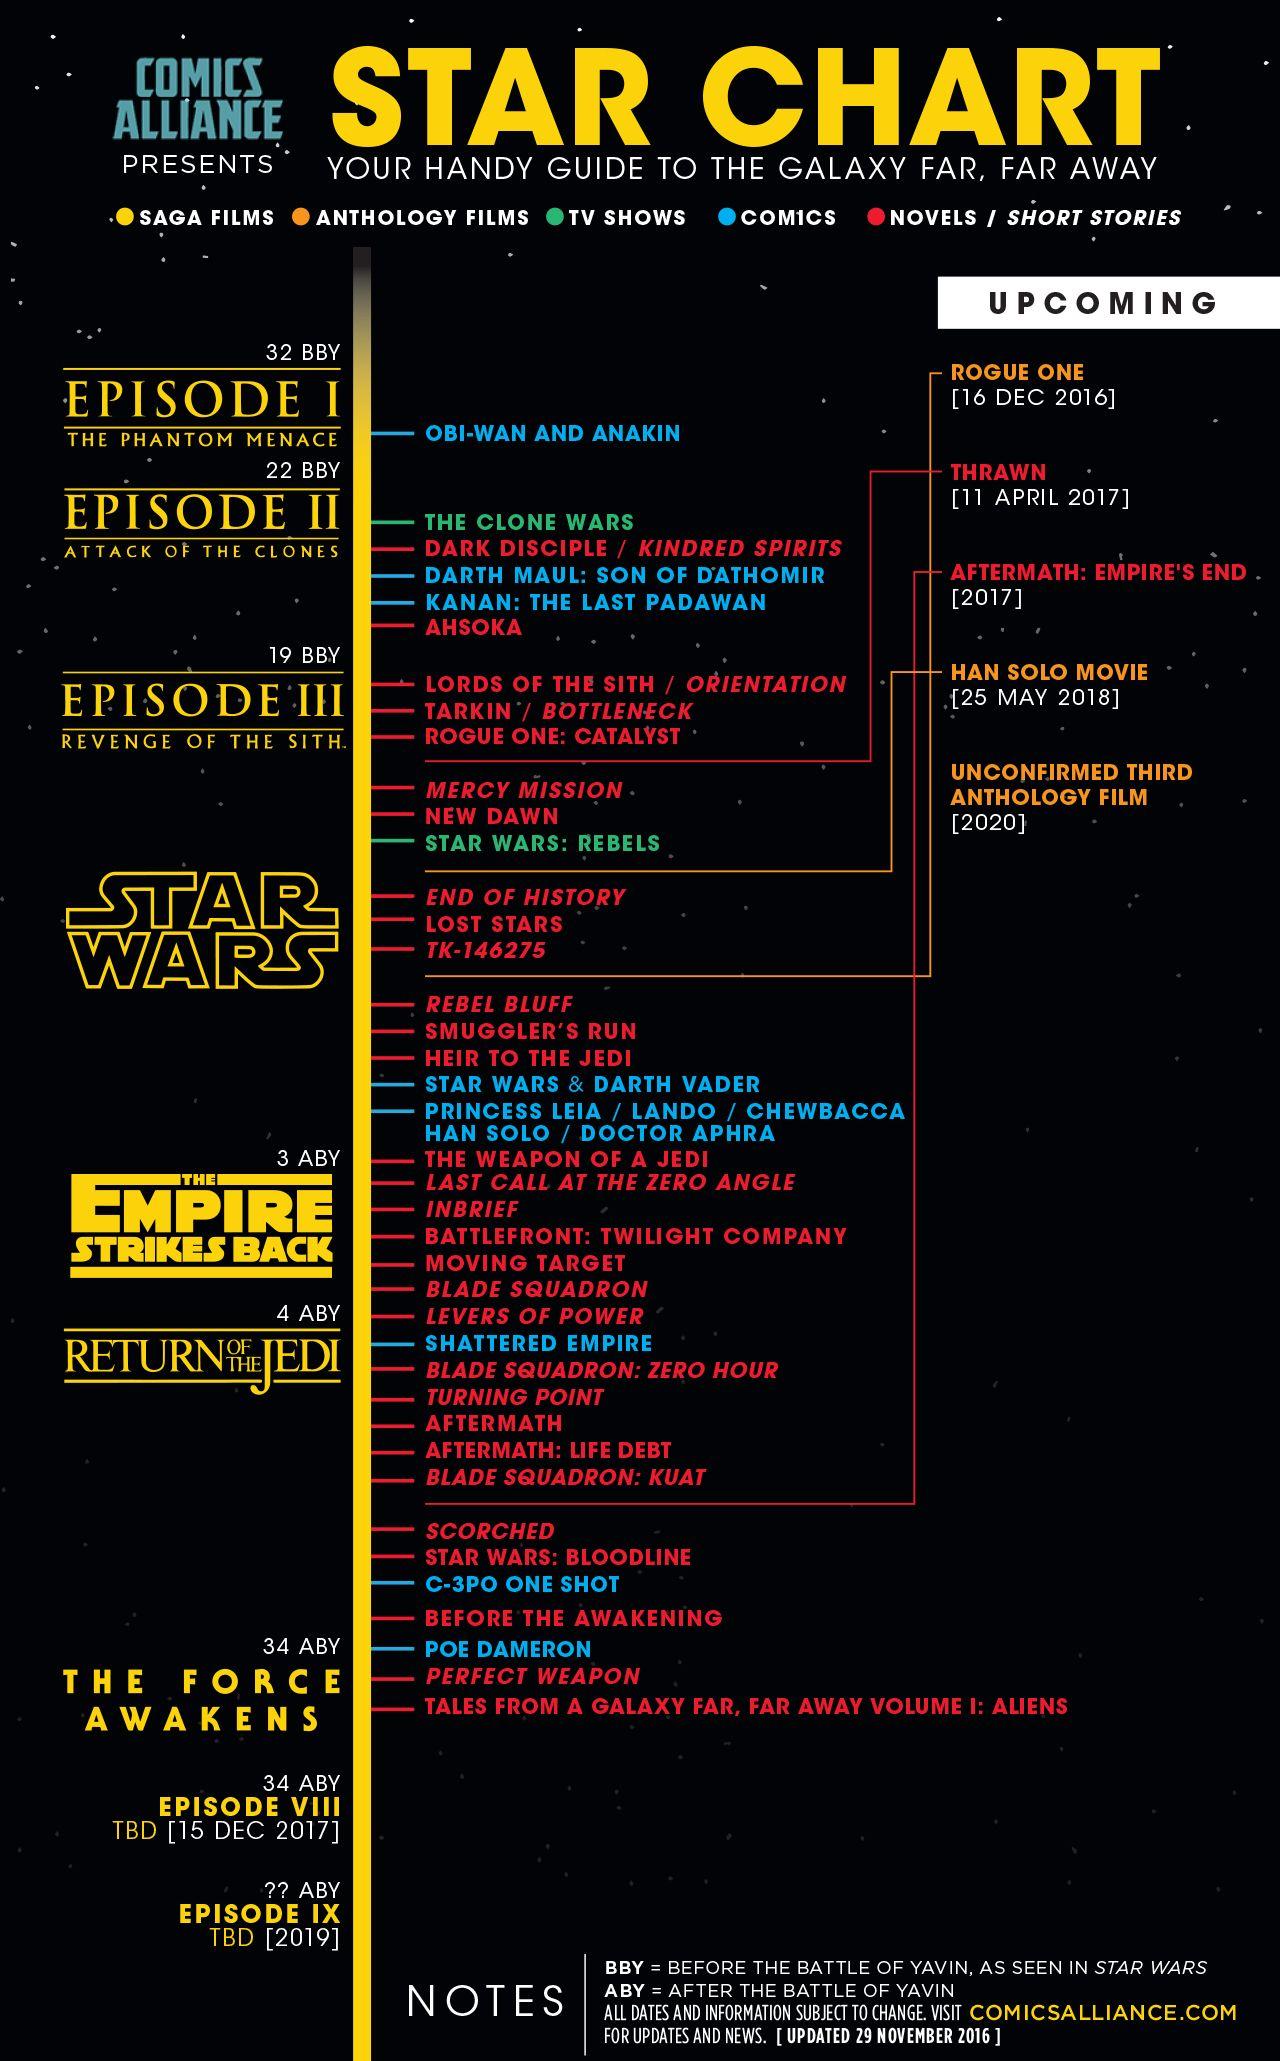 Star Wars Canon Timeline : canon, timeline, Timeline, Films,, Books, Comics,, Where, Official, Ne…, Timeline,, Canon,, Movies